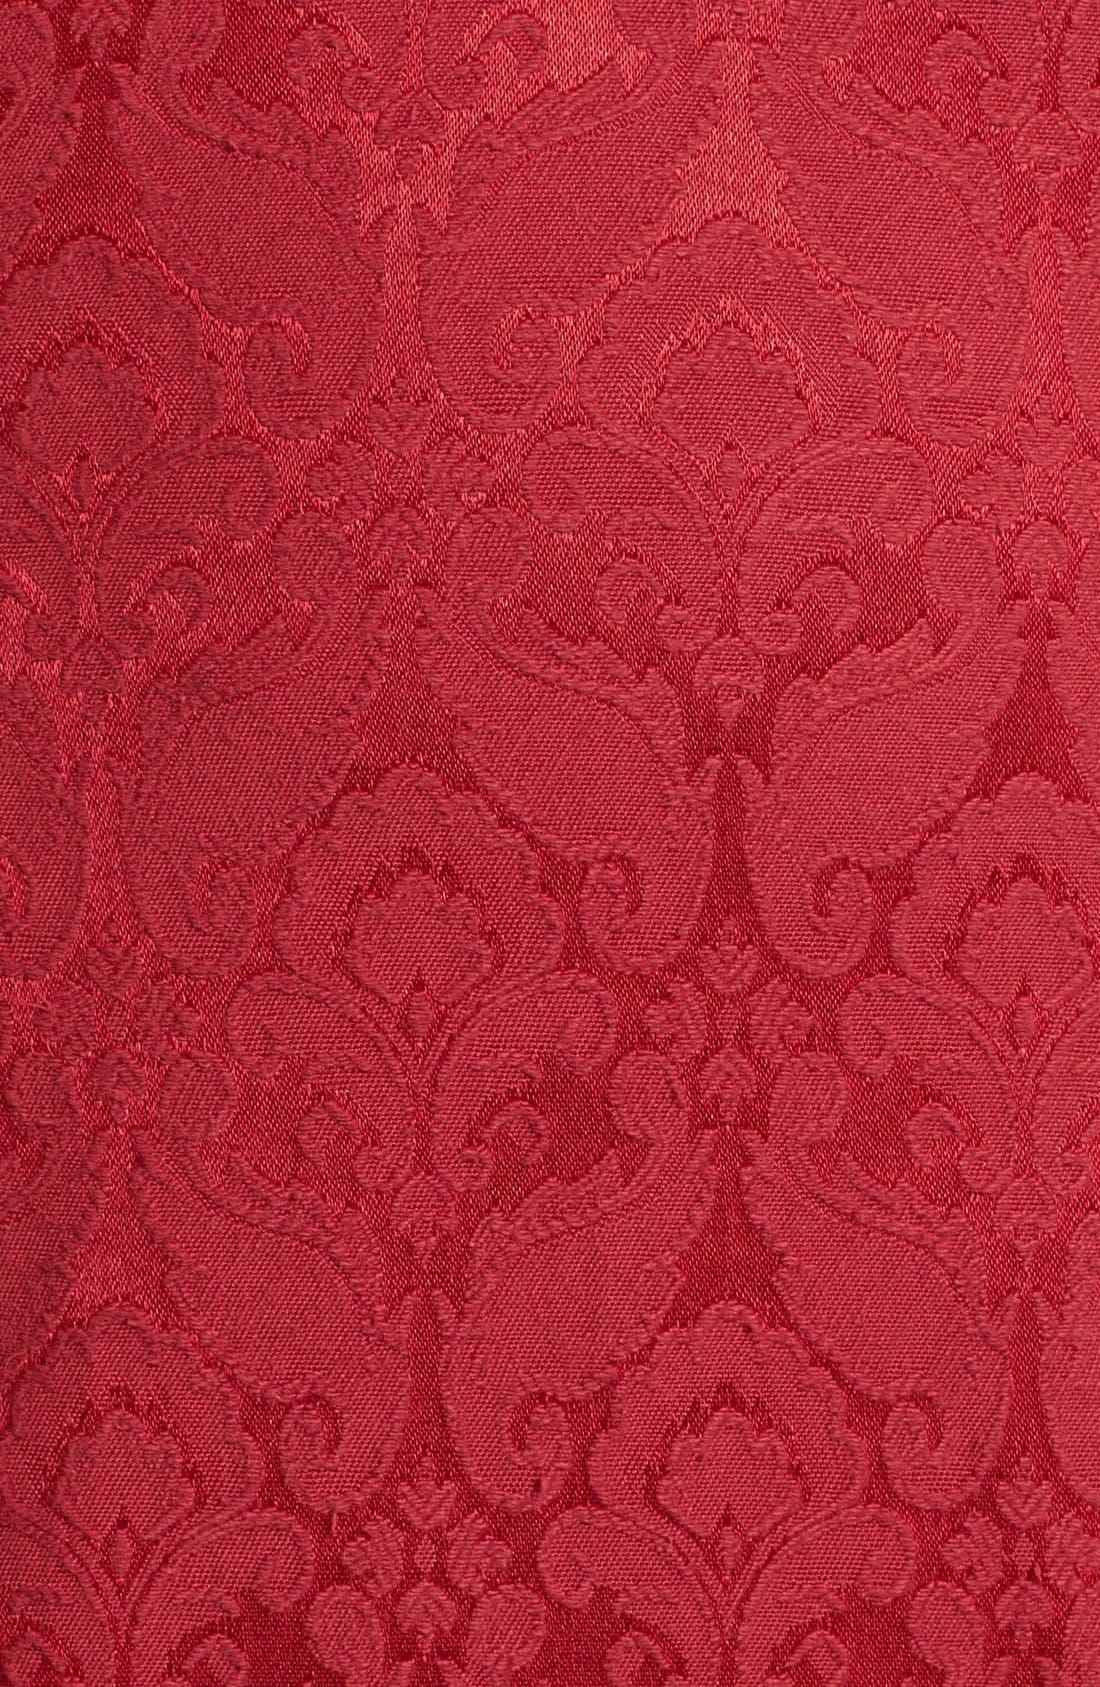 Alternate Image 3  - Maggy London Embellished Brocade Sheath Dress